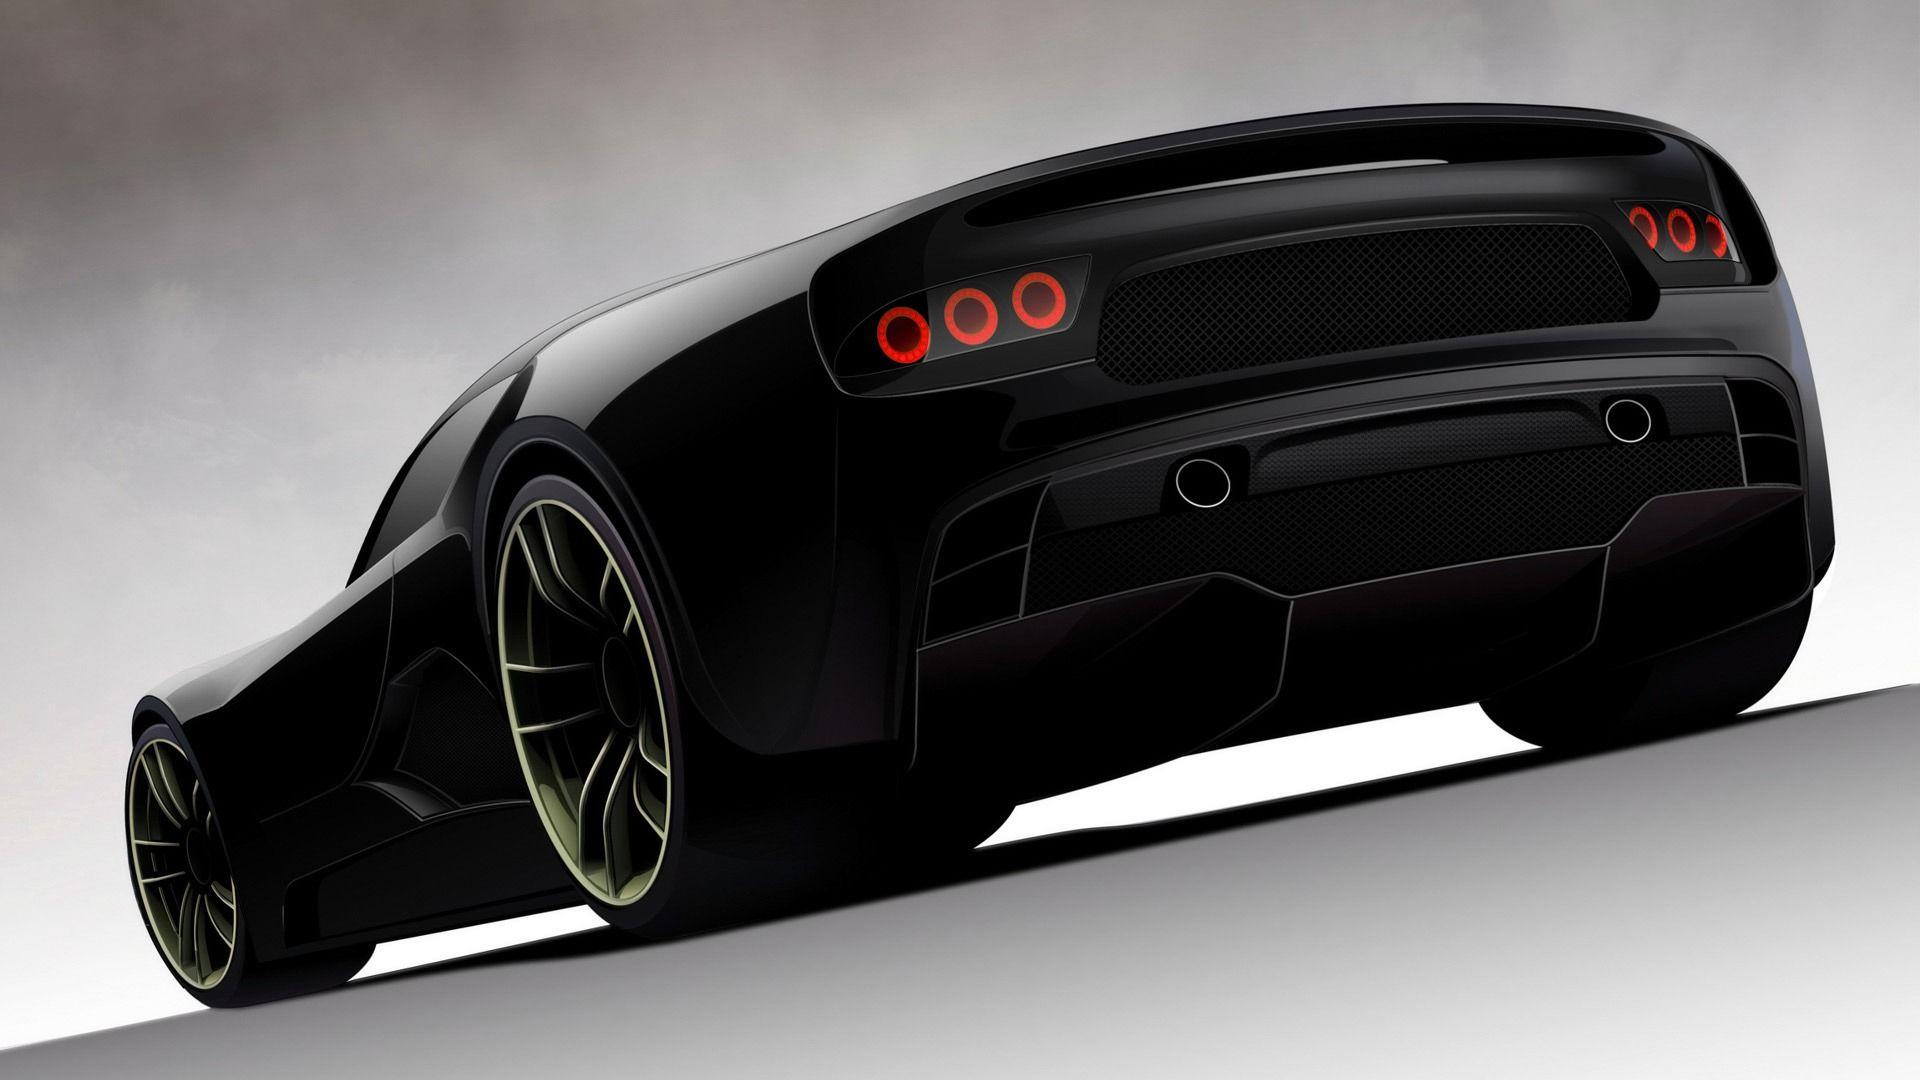 RZ Ultima Concept | Cars HD Wallpapers | Pinterest | Hd wallpaper ...